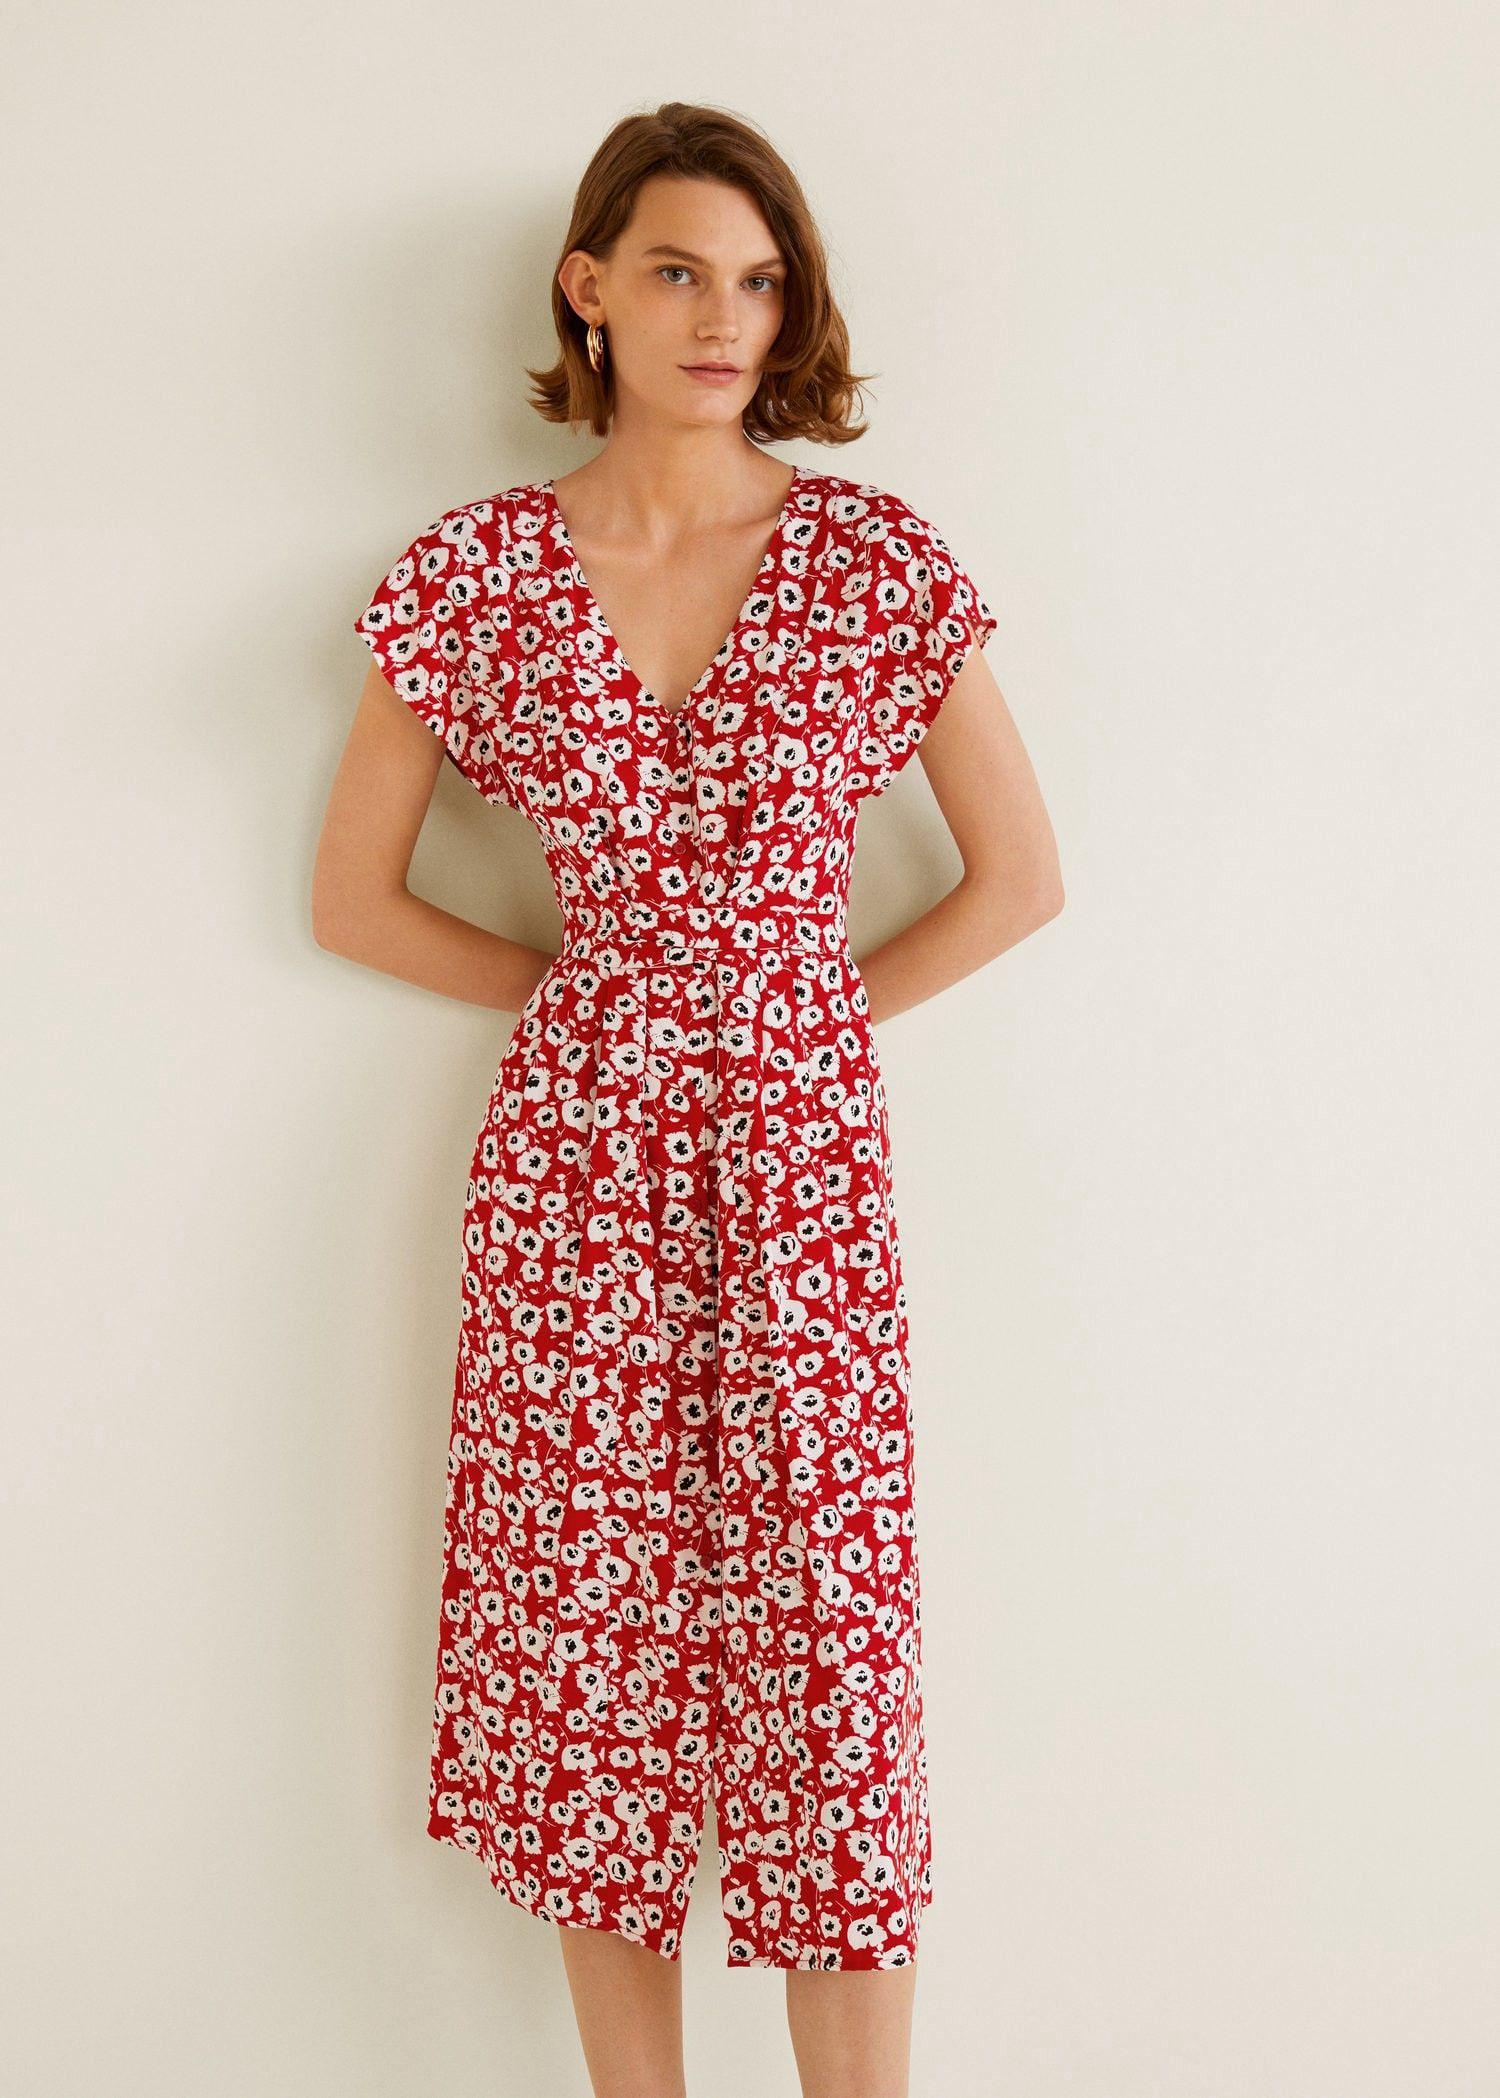 785288b217 Mango Flower Print Dress - Dark Navy 6